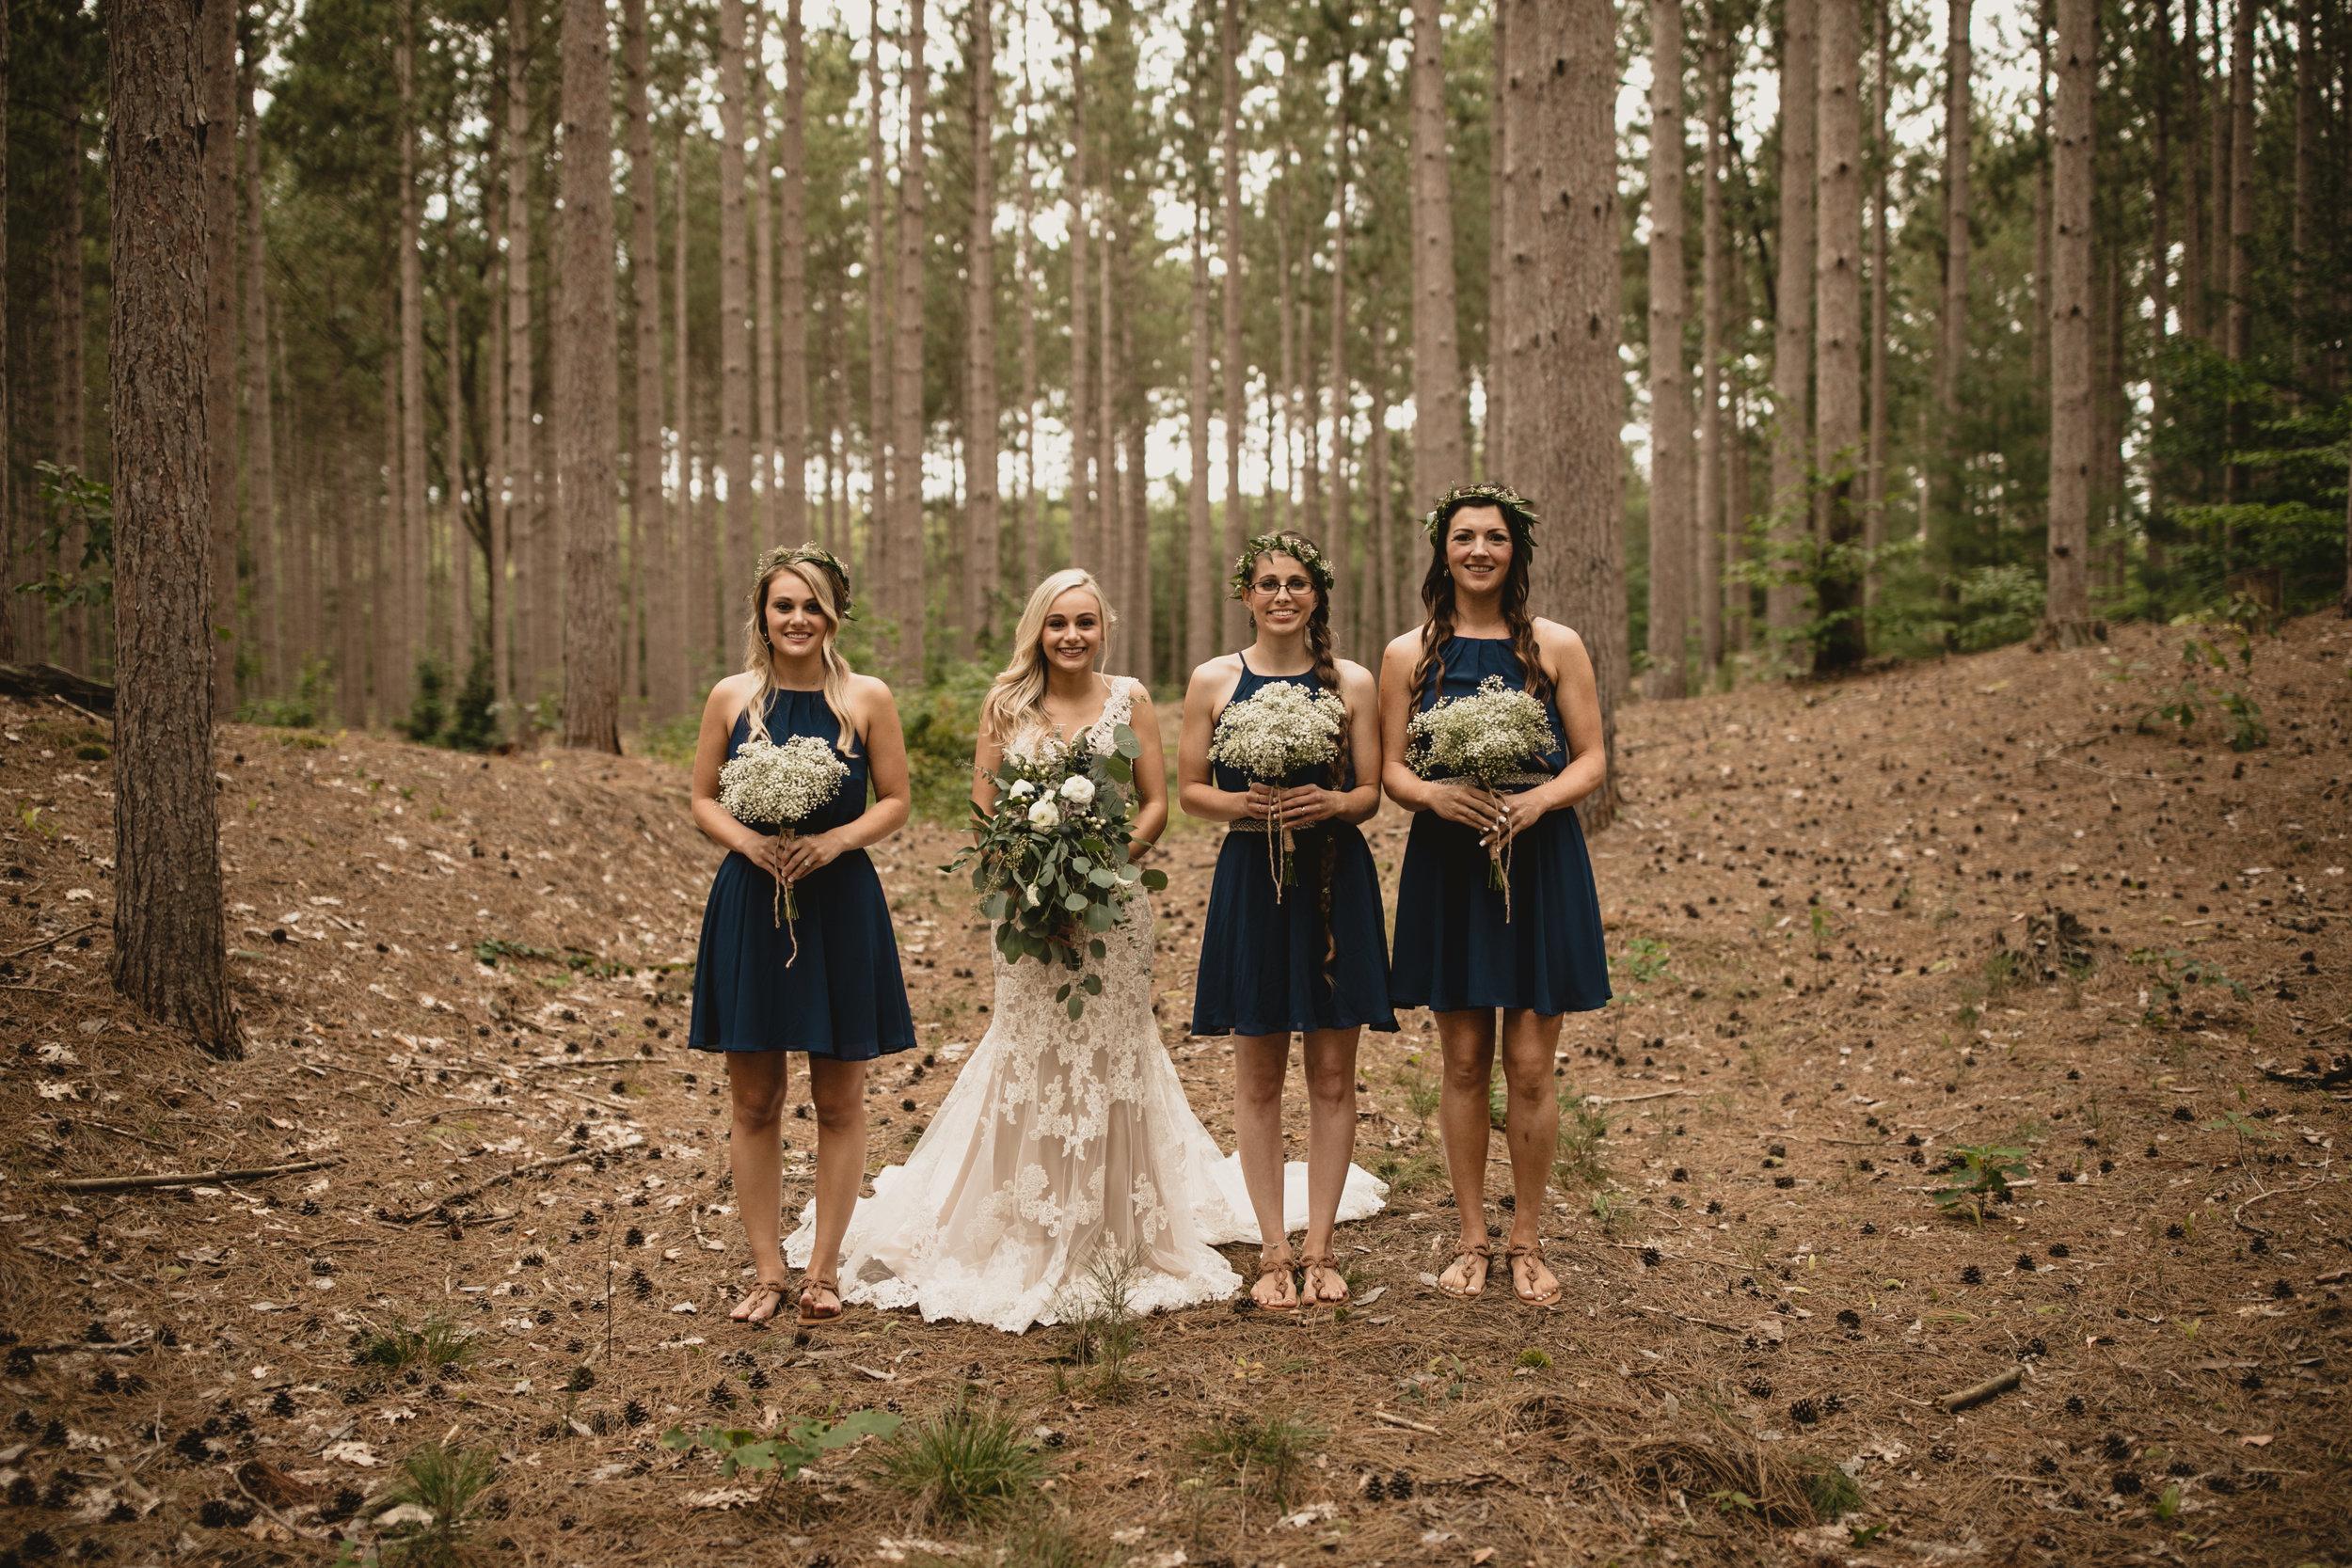 west-michigan-wedding-photographer-whitehall-rachel-austin-chapel-in-the-pines-441.jpg